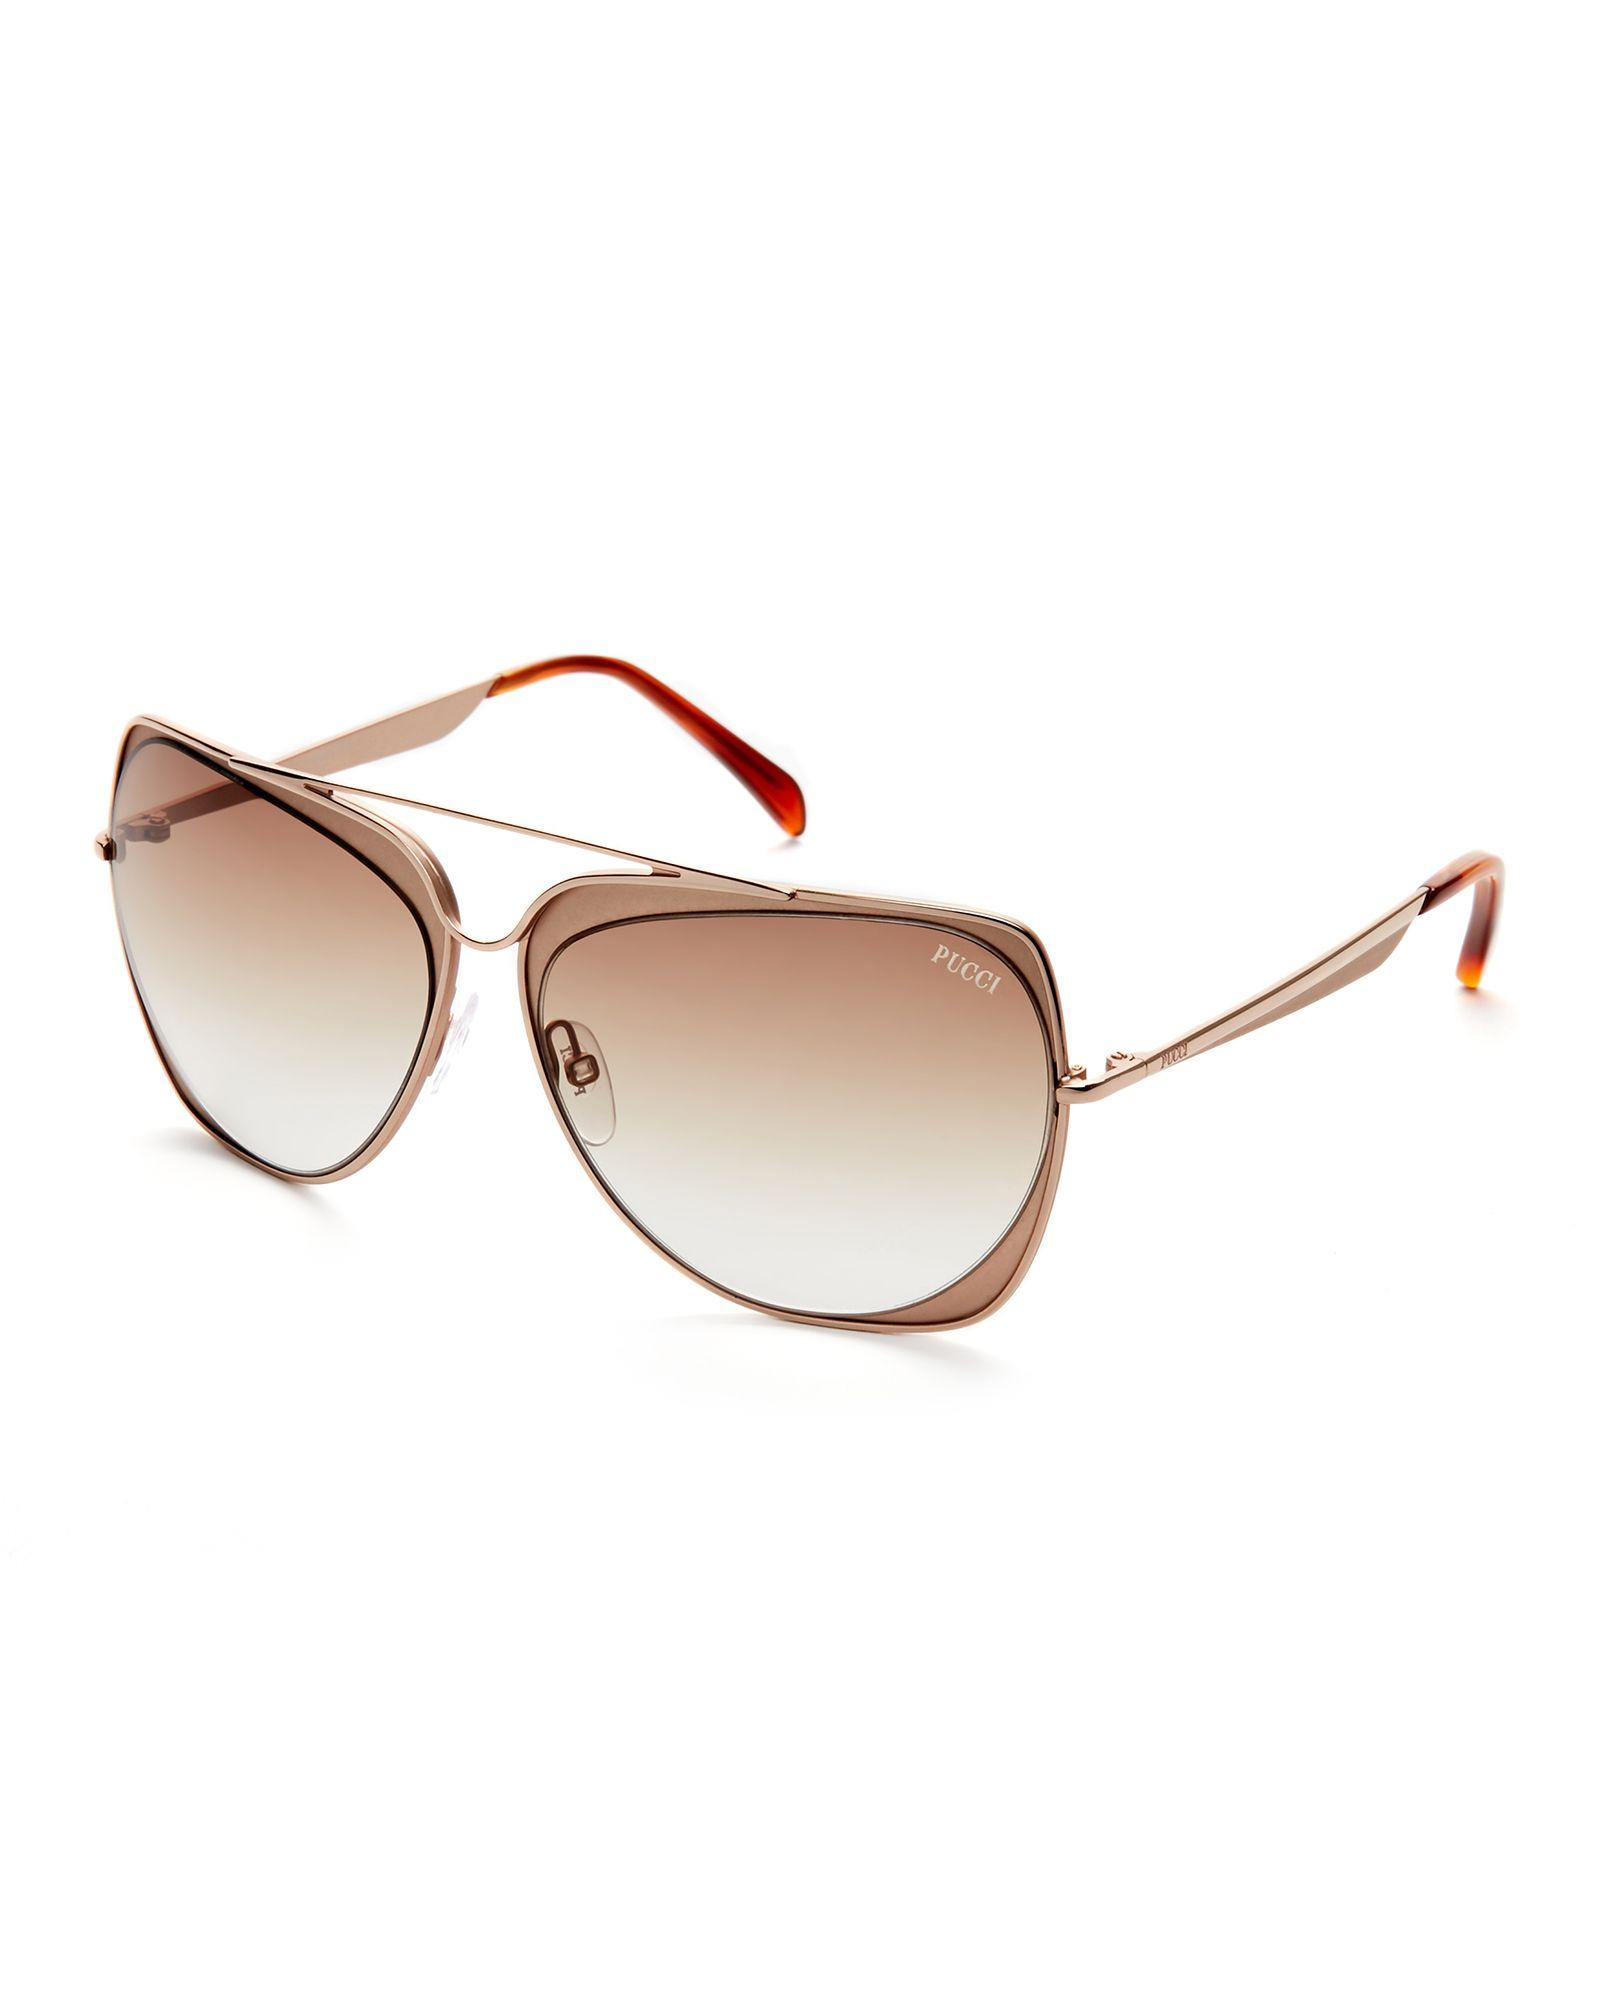 f637bbc79d Emilio Pucci Rose Gold-Tone EP0004 Square Sunglasses